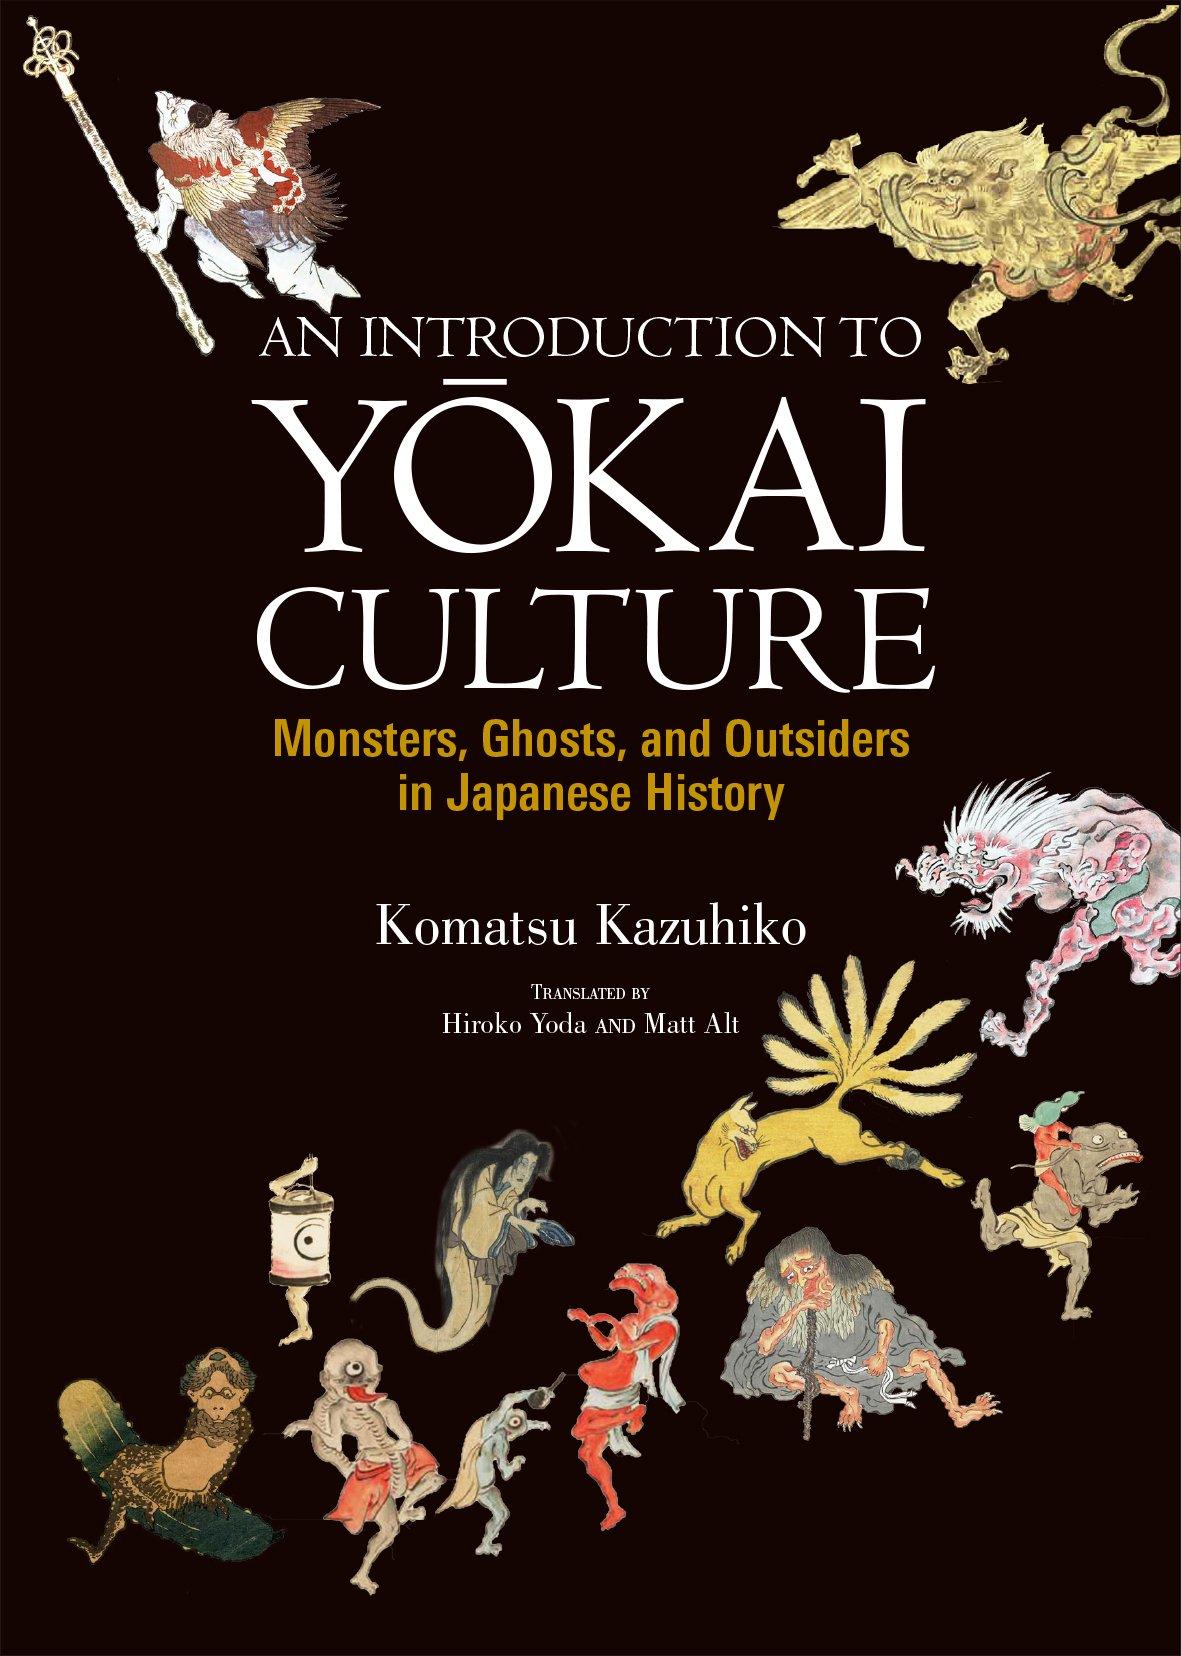 Introduction to Yōkai Culture